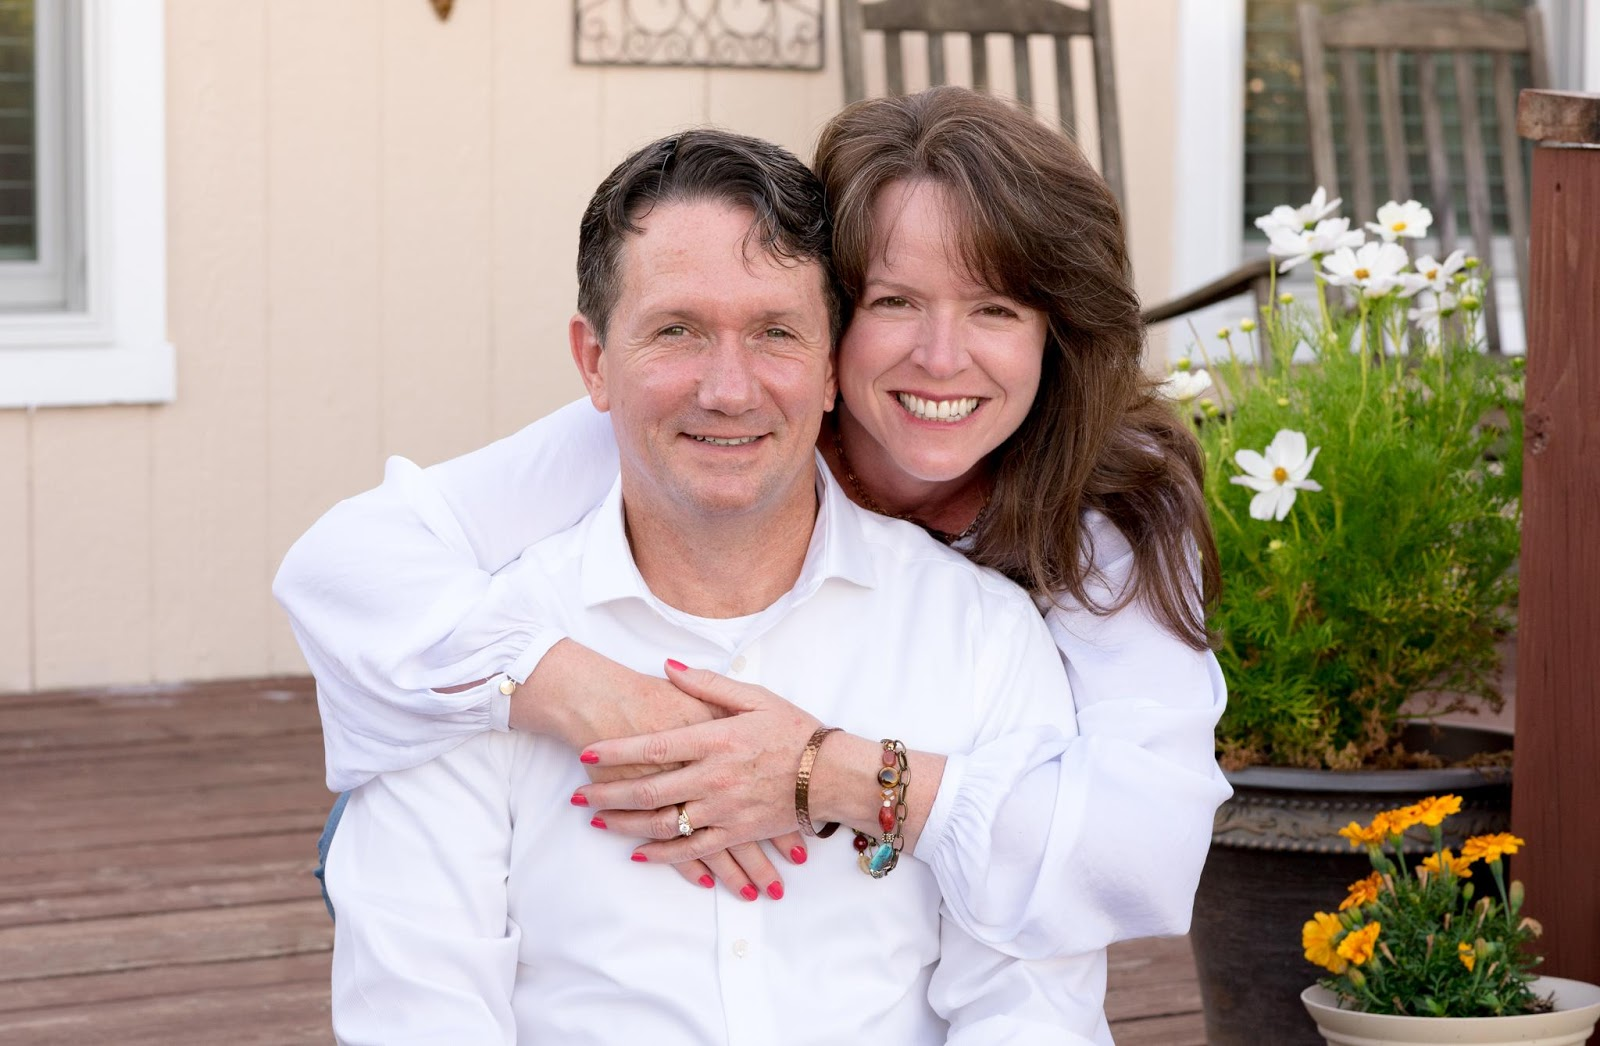 Floyd and Melissa Sheldon